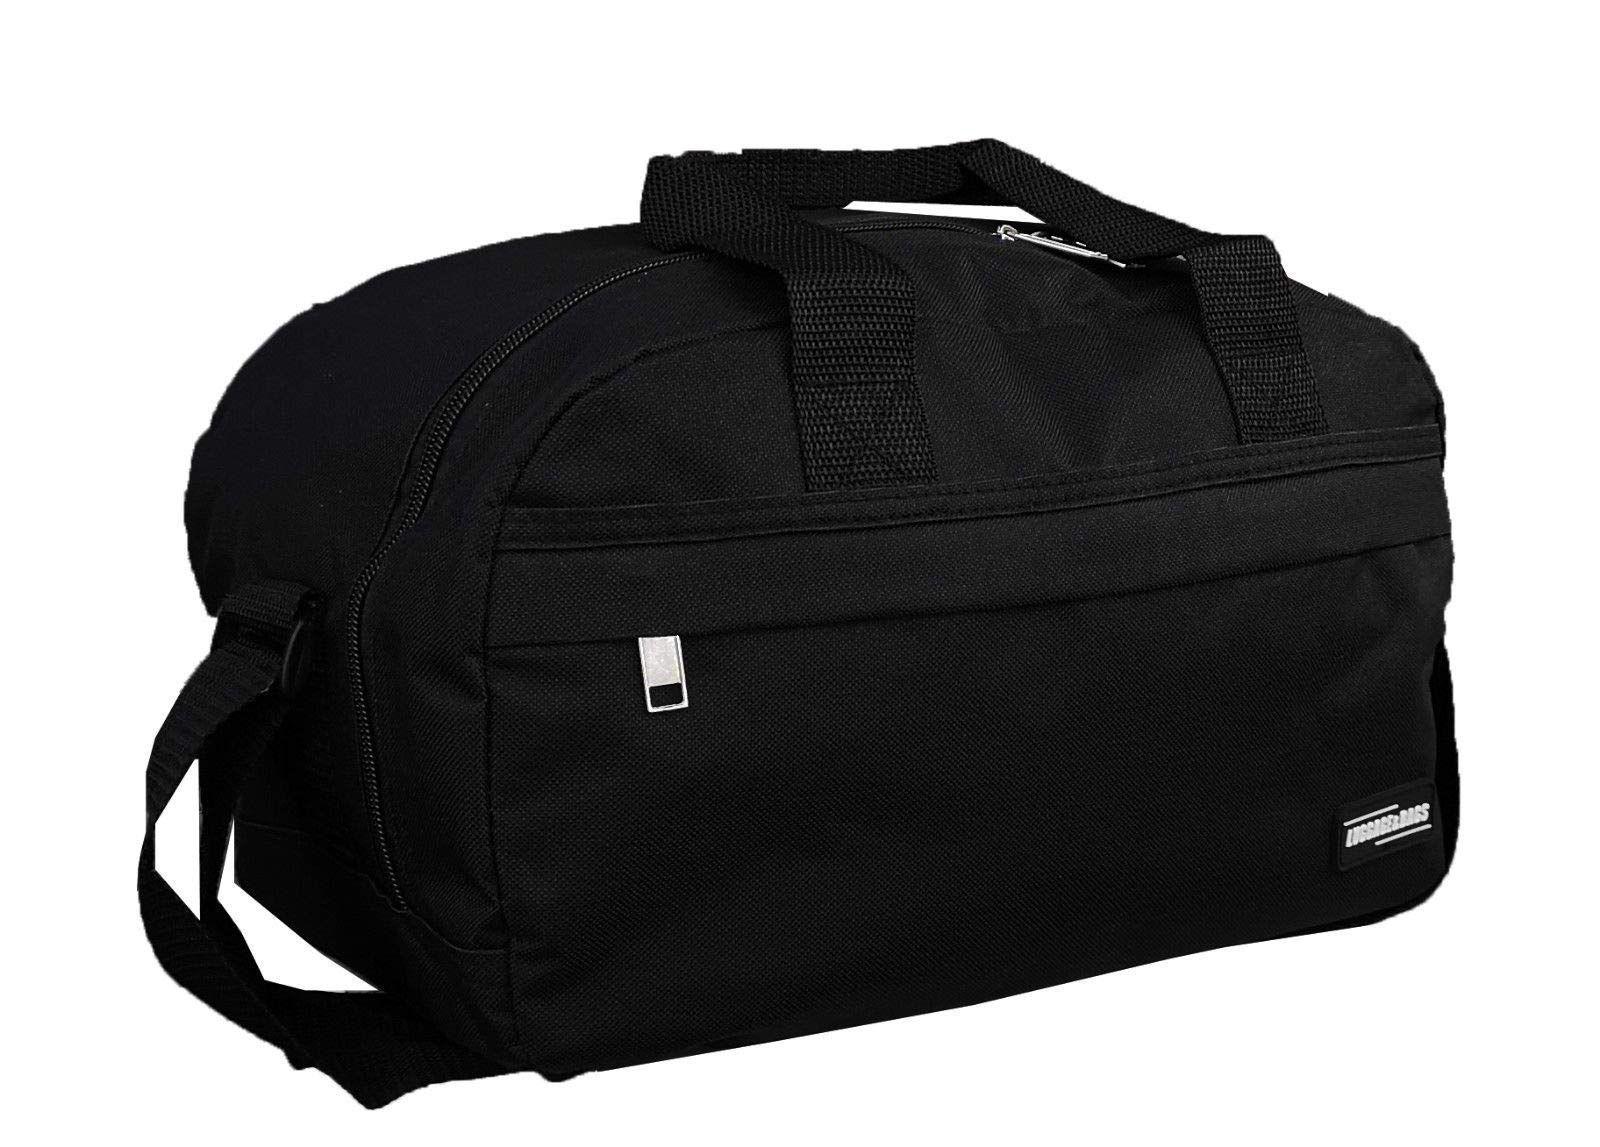 Ryanair Small Second Hand Luggage Travel Cabin Shoulder Flight Bag